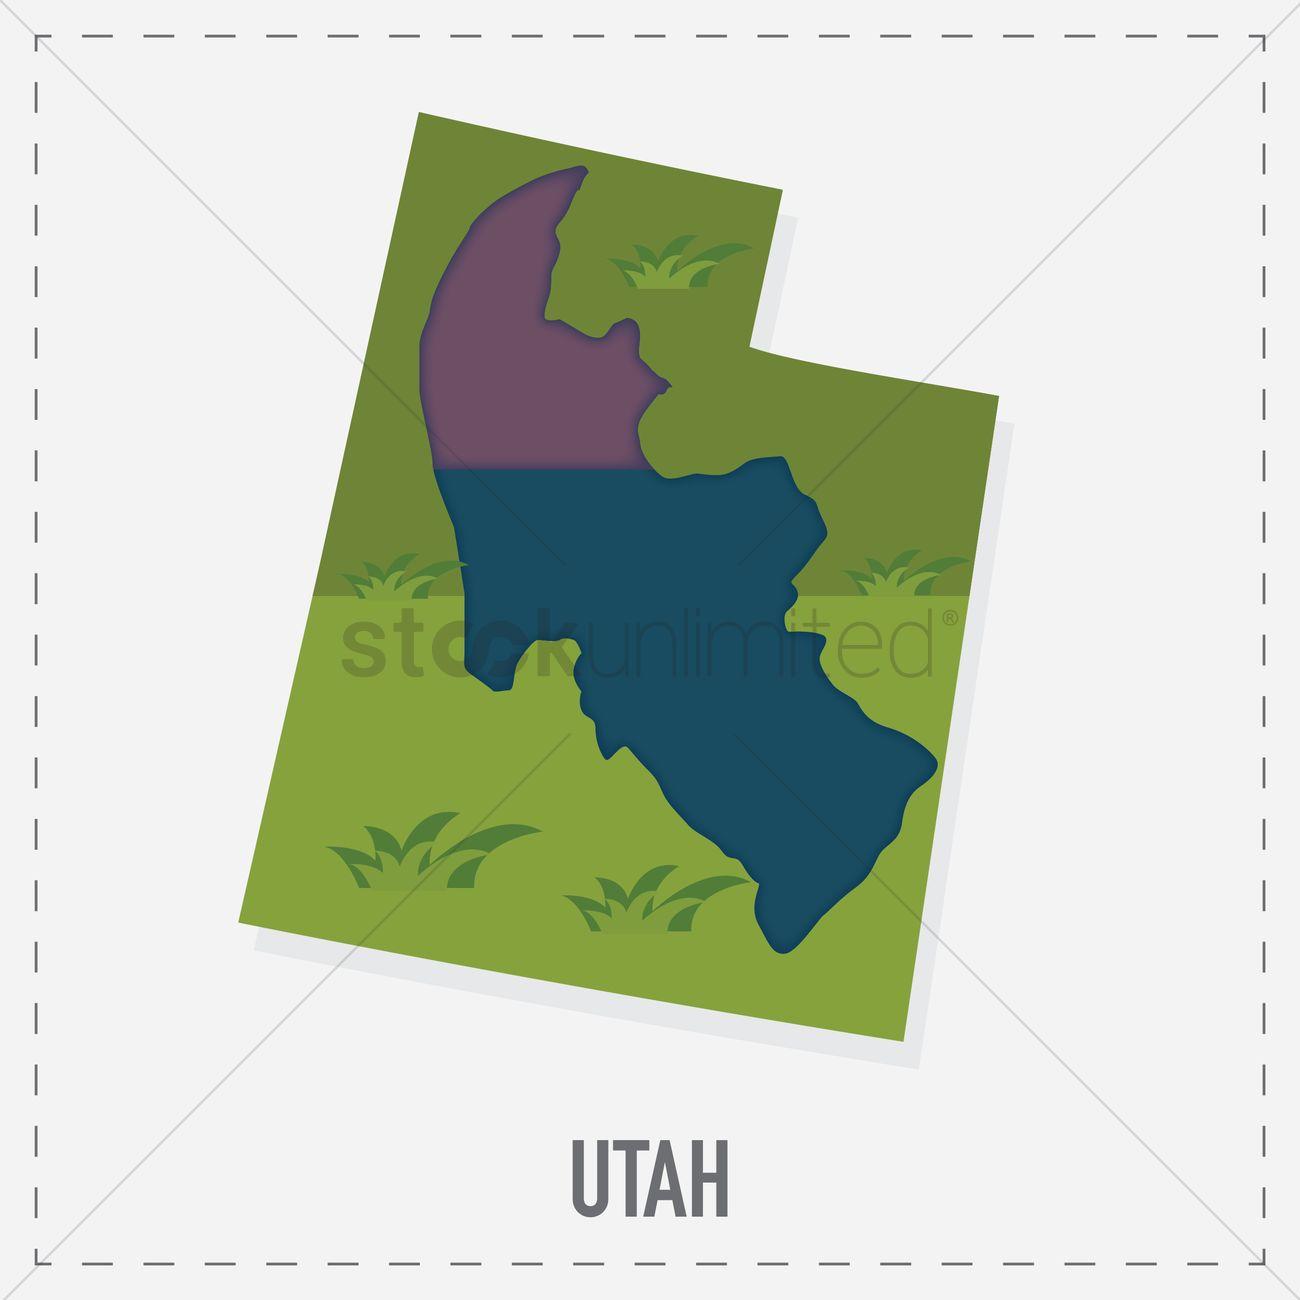 Utah map sticker vector image 1562448 stockunlimited utah map sticker vector graphic gumiabroncs Images